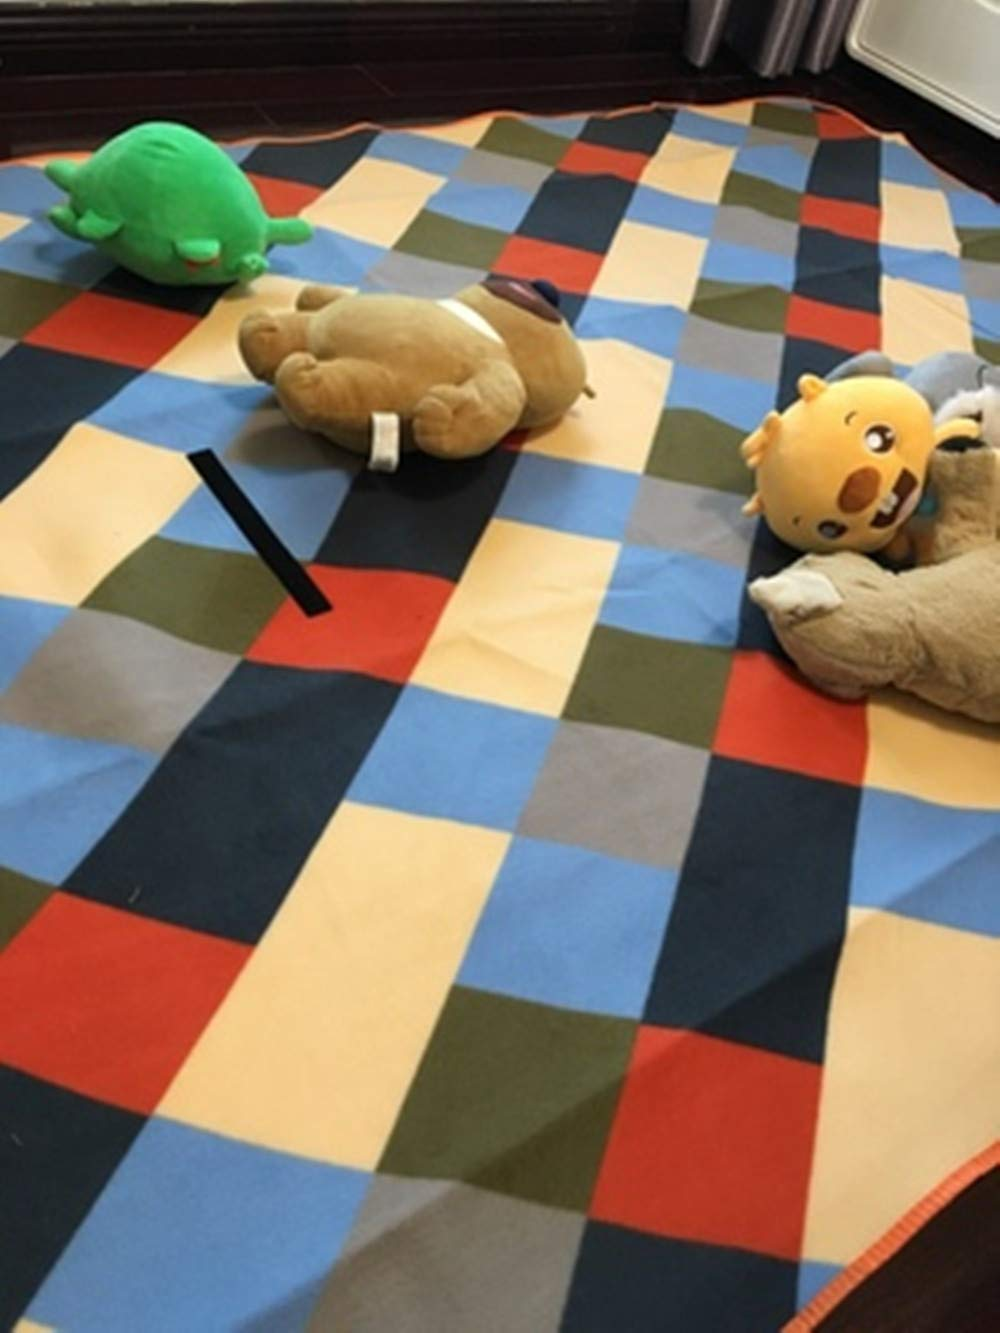 Zhxinashu Tragbare Faltende Faltende Faltende Große Picknick Matte - Wasserdicht Verdicken Outdoor Reise Camping(A 200  200) B07P2BK52F | Hochwertig  9277f3